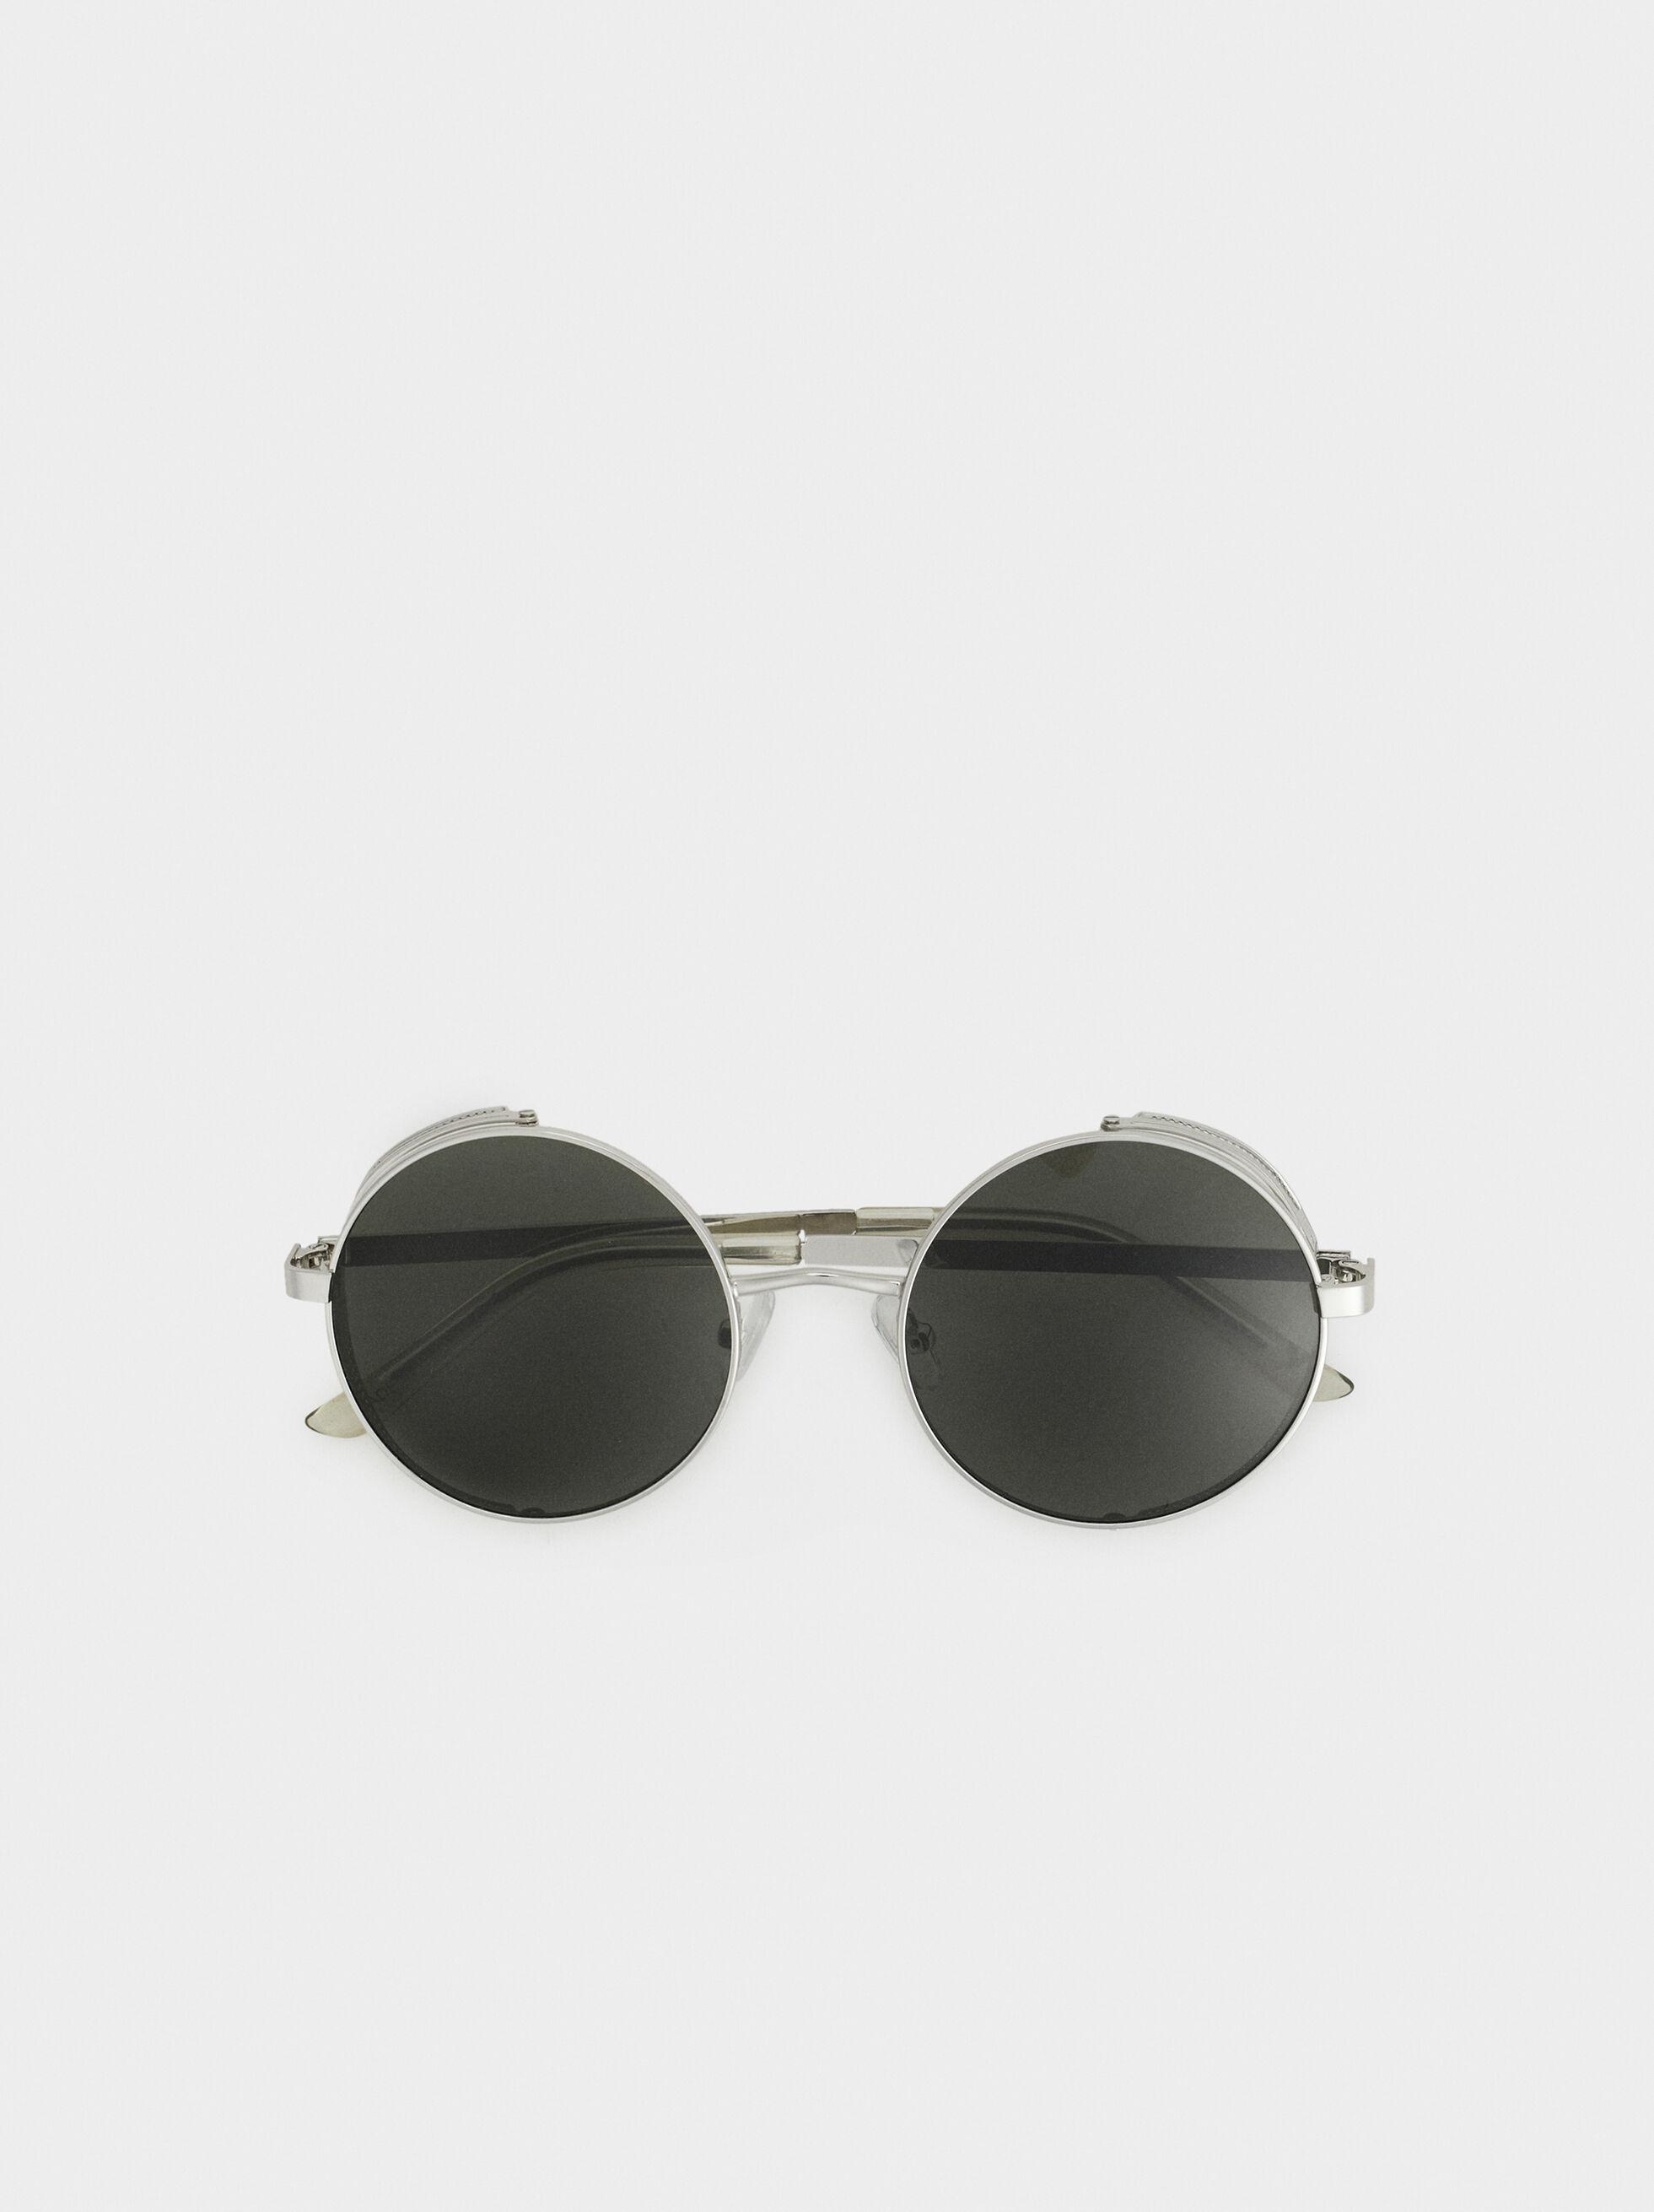 Round Sunglasses, Silver, hi-res